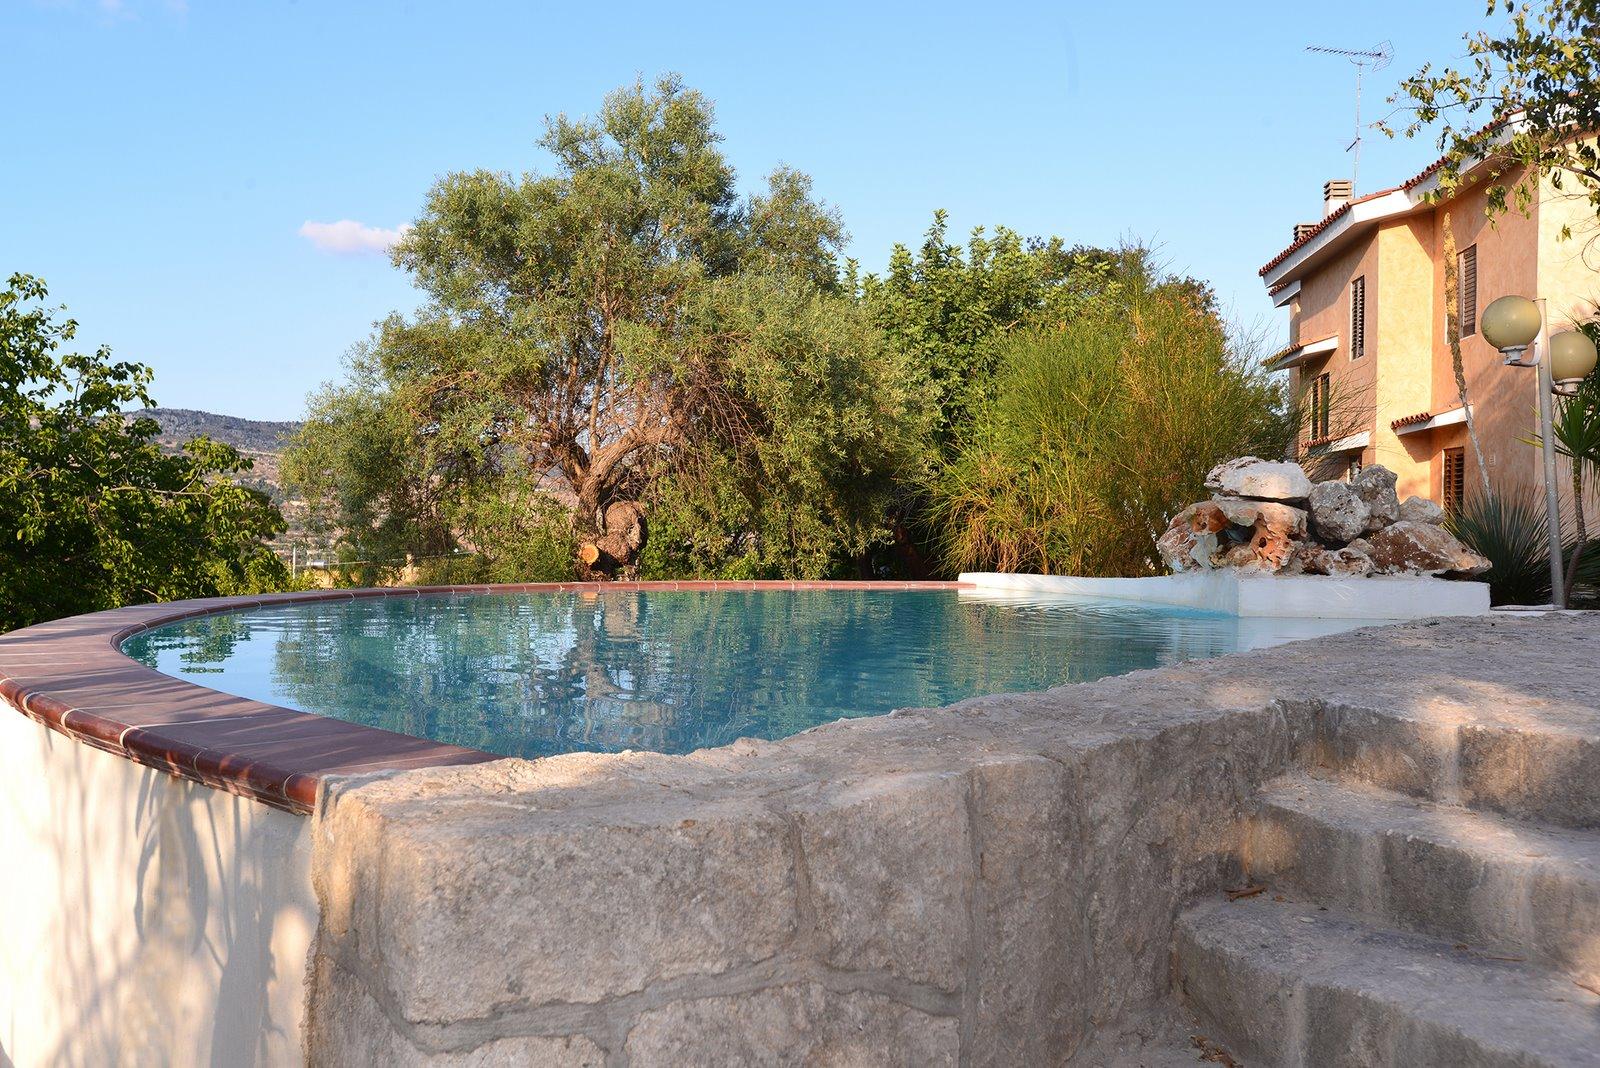 Maison de vacances Villa Casa (1531407), Solarino, Siracusa, Sicile, Italie, image 24